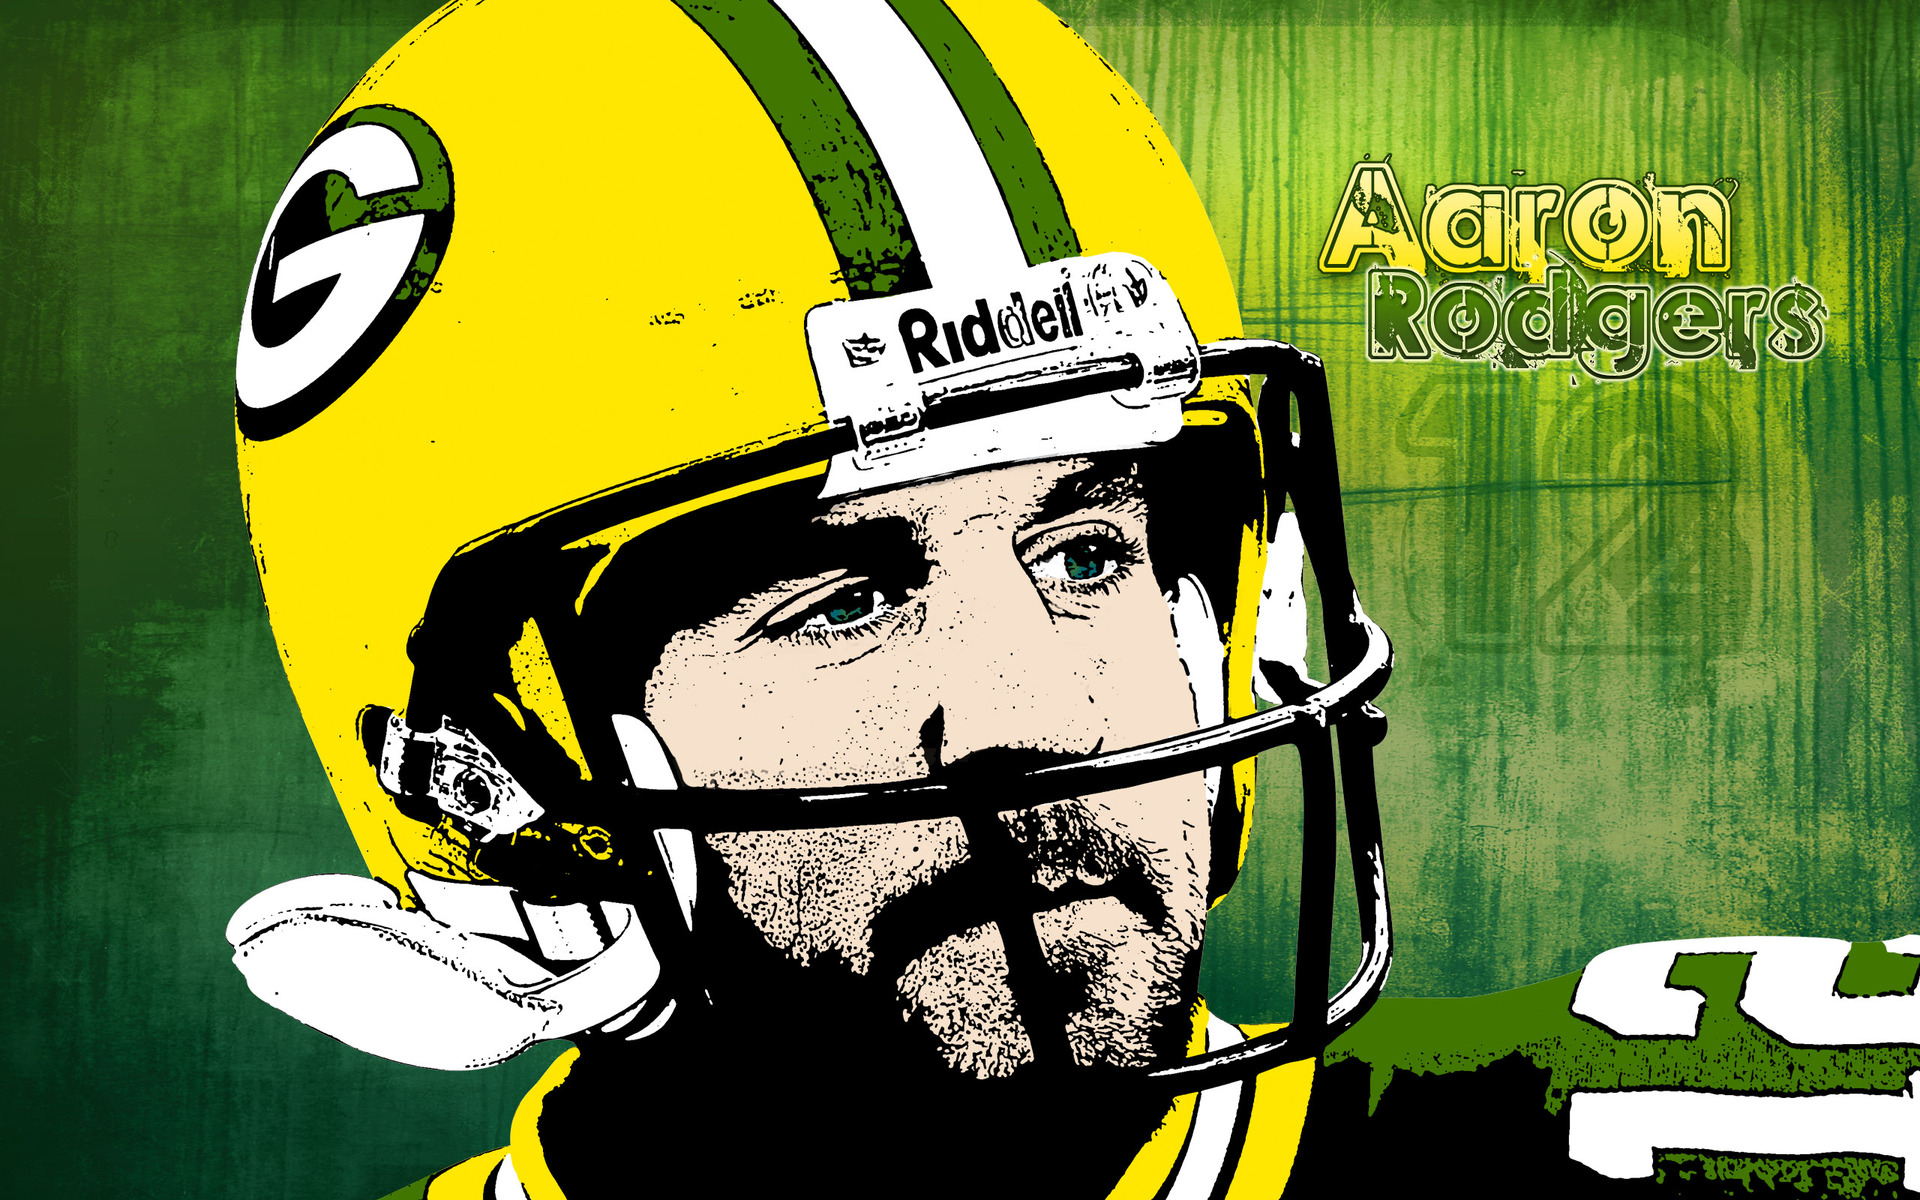 Aaron Rodgers   Green Bay Packers wallpaper 18507 1920x1200